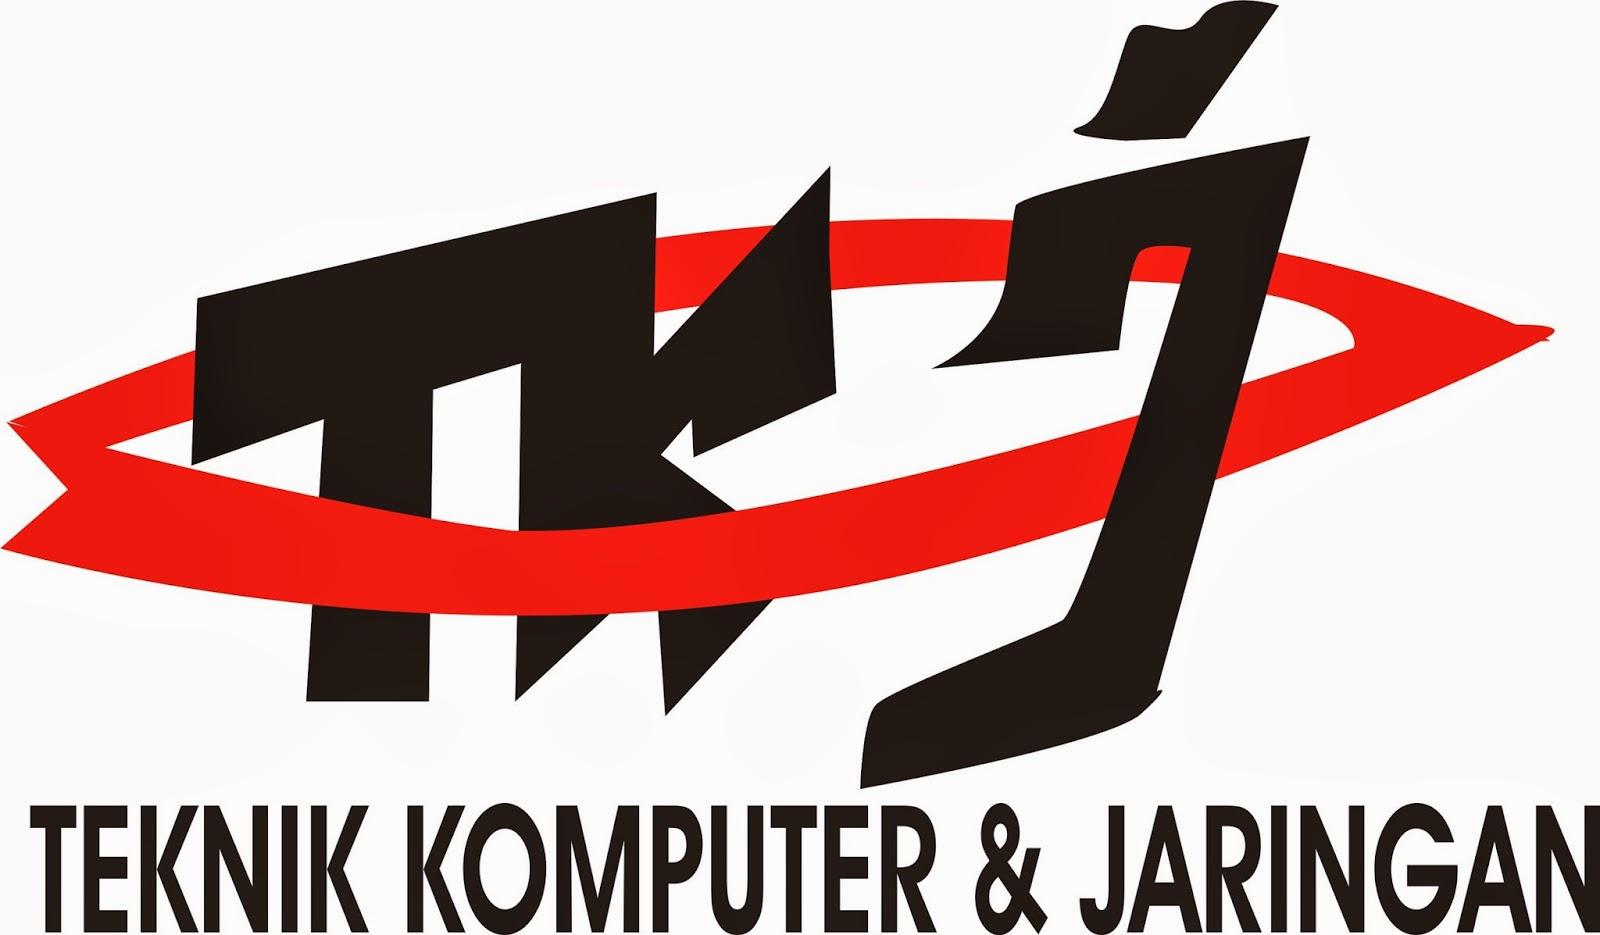 Pengertian Teknik Komputer Dan Jaringan Arti Topologi Jaringan Komputer